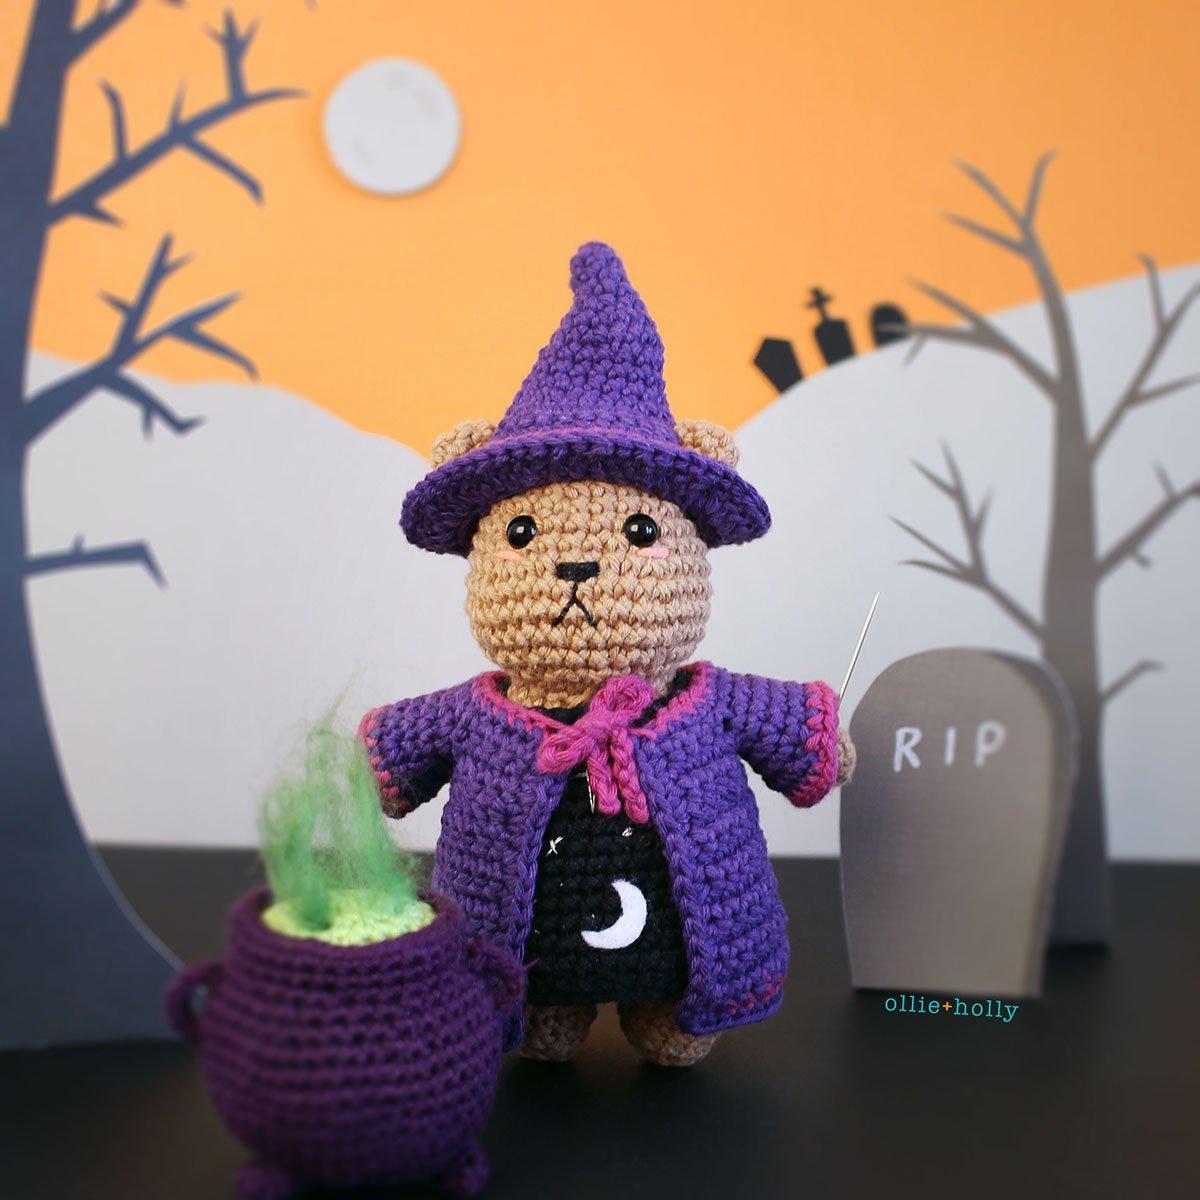 Free Witch Halloween Costume for Bernadette the Bear Stuffed Animal Amigurumi Crochet Pattern Background